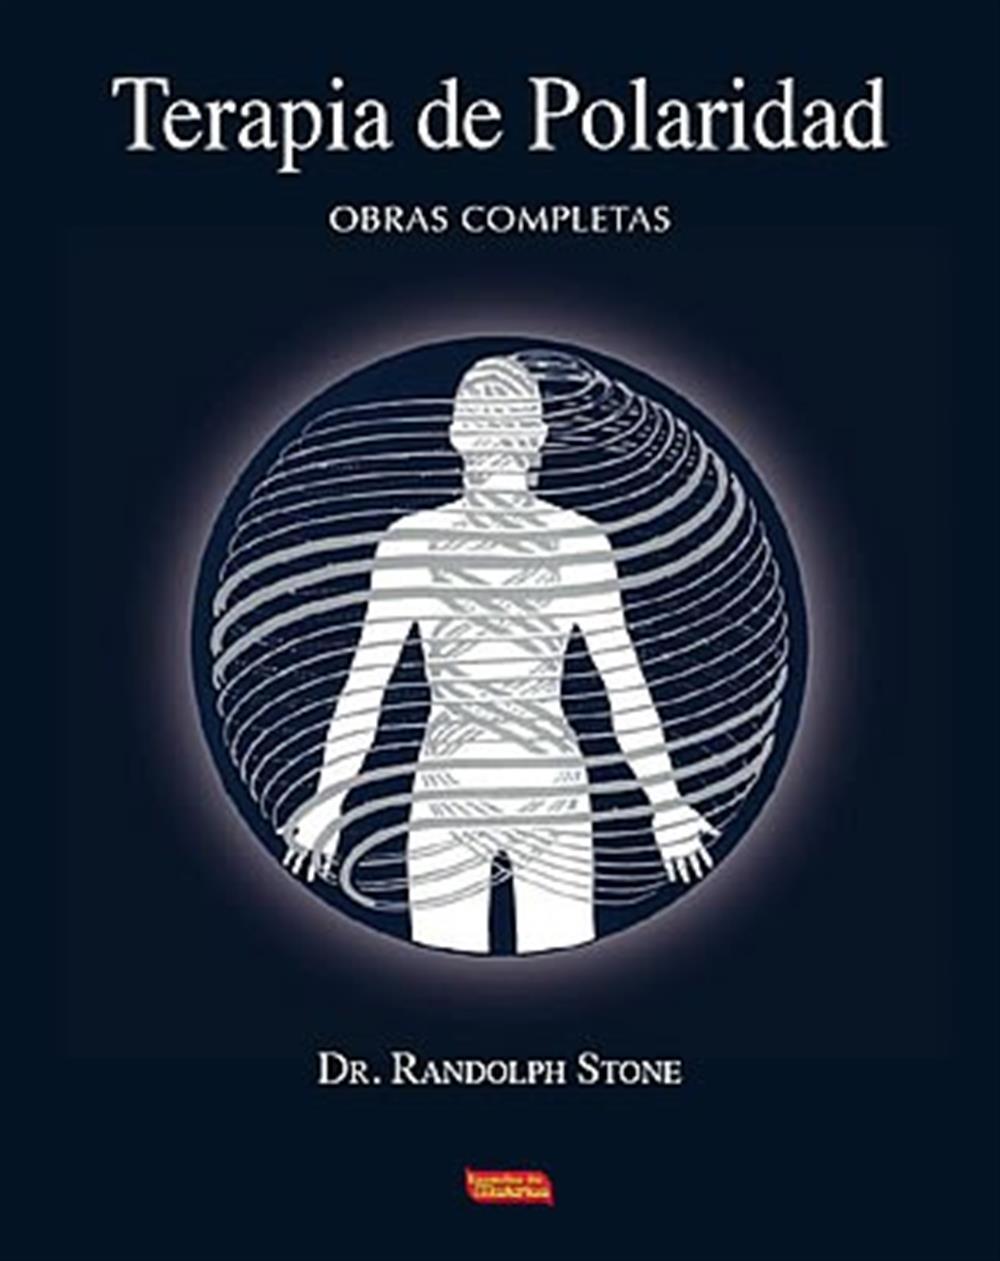 Terapia de Polaridad Obras Completas - Dr. Randolph Stone